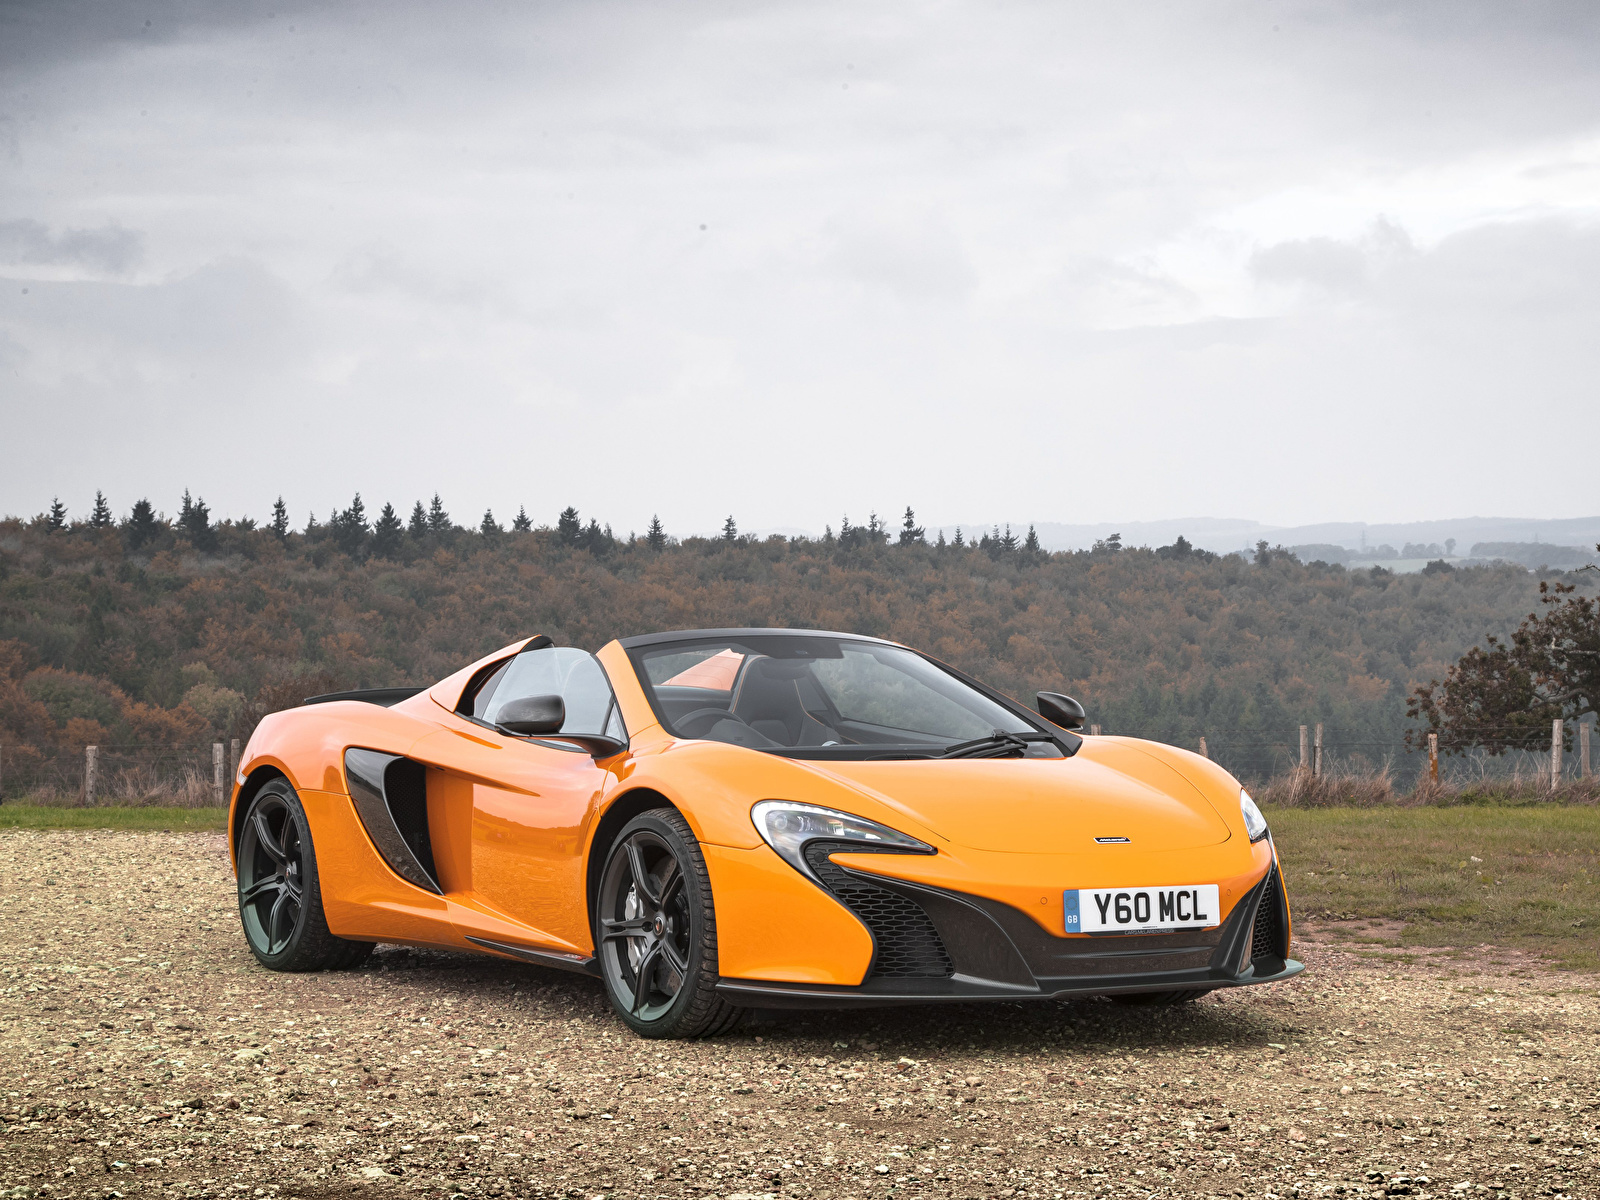 Обои для рабочего стола McLaren 2014-16 650S Spyder Родстер желтая Металлик автомобиль 1600x1200 Макларен желтых желтые Желтый авто машина машины Автомобили